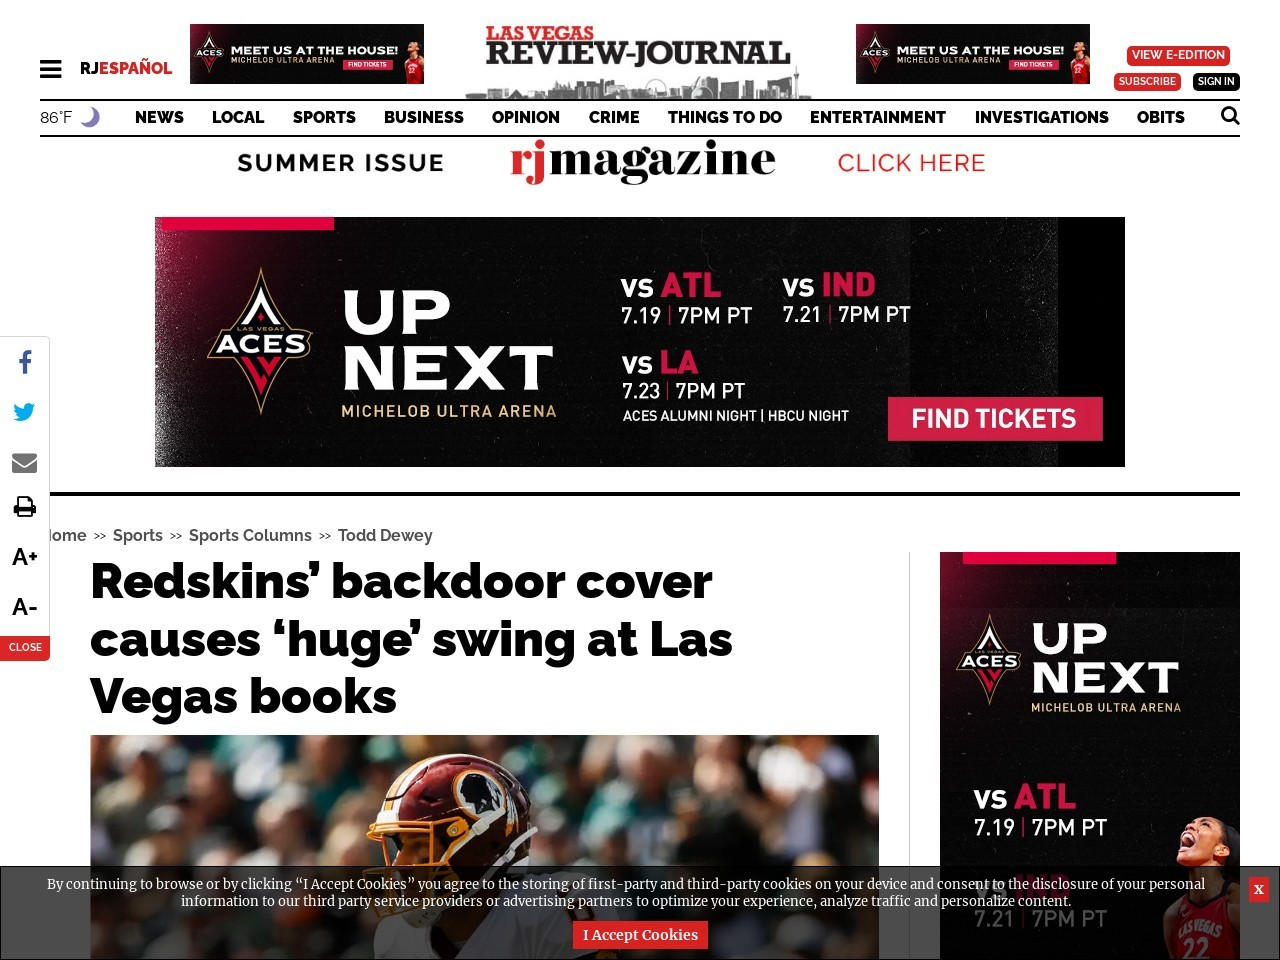 Redskins' backdoor cover causes 'huge' swing at Las Vegas books